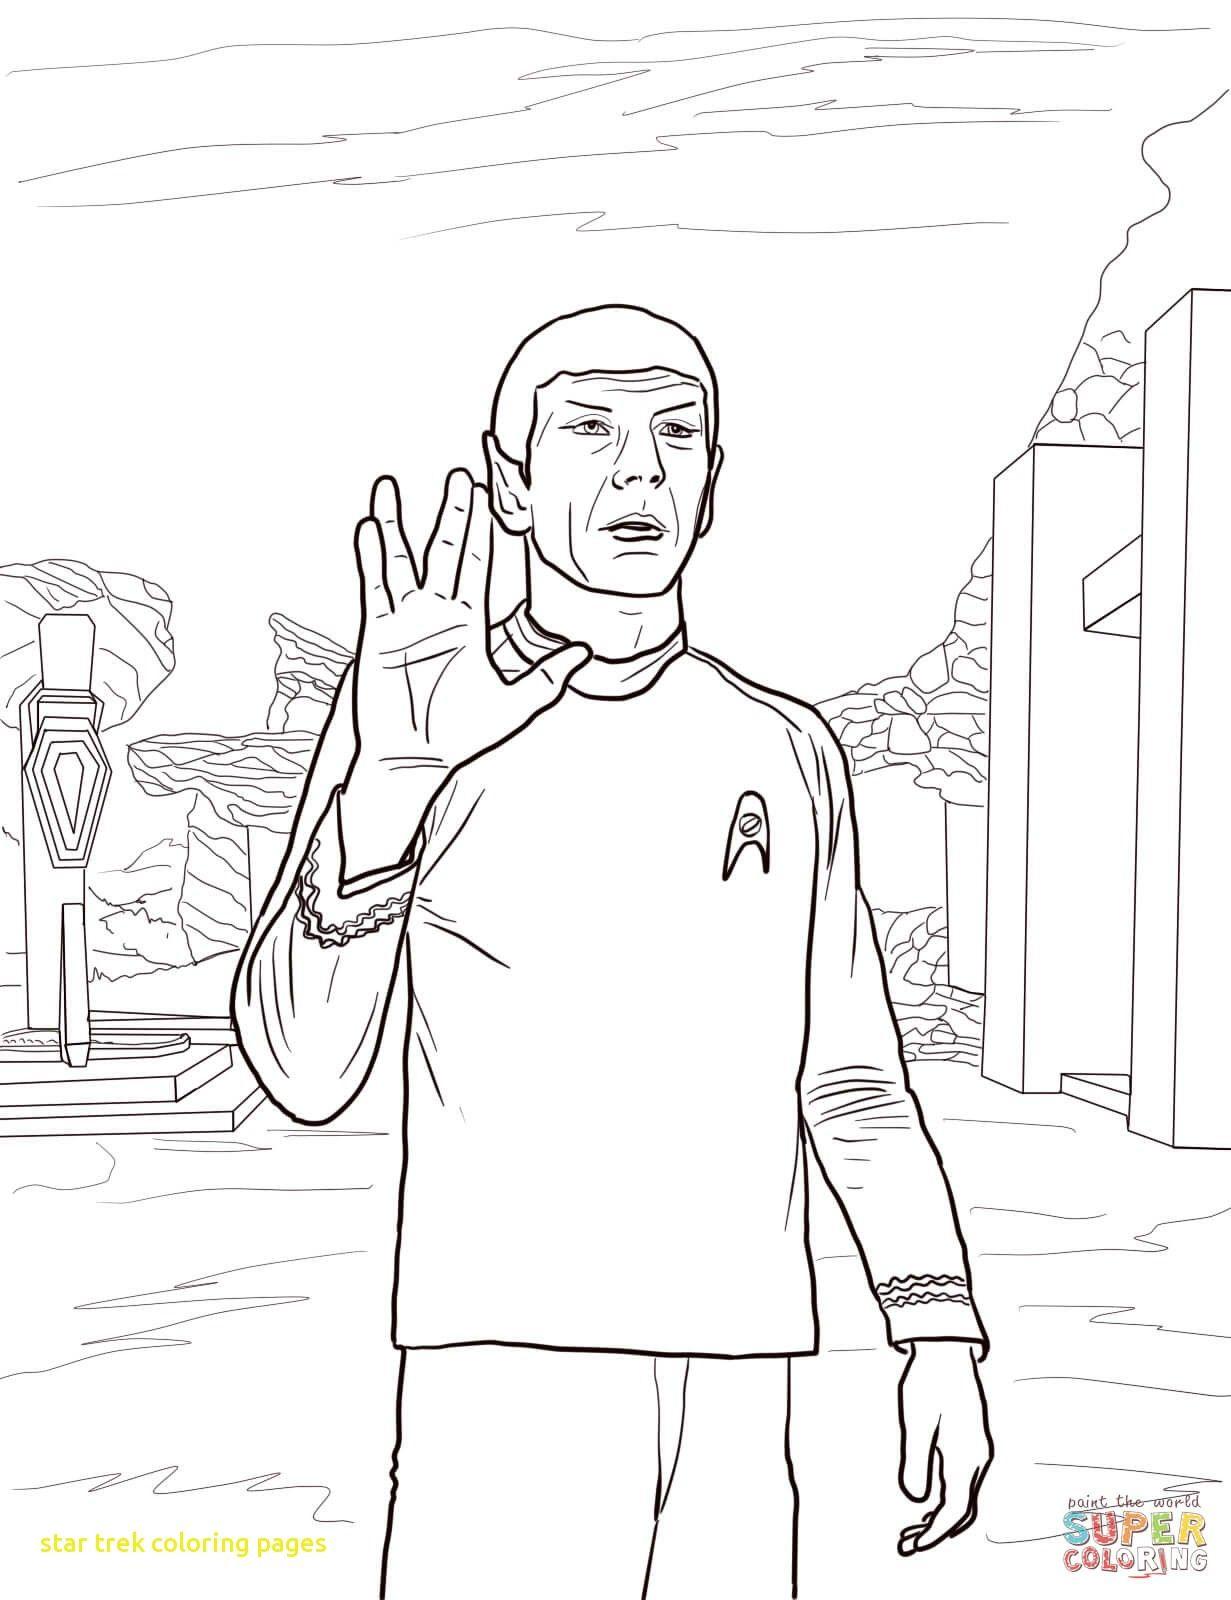 Star Trek Coloring Pages at GetDrawings | Free download